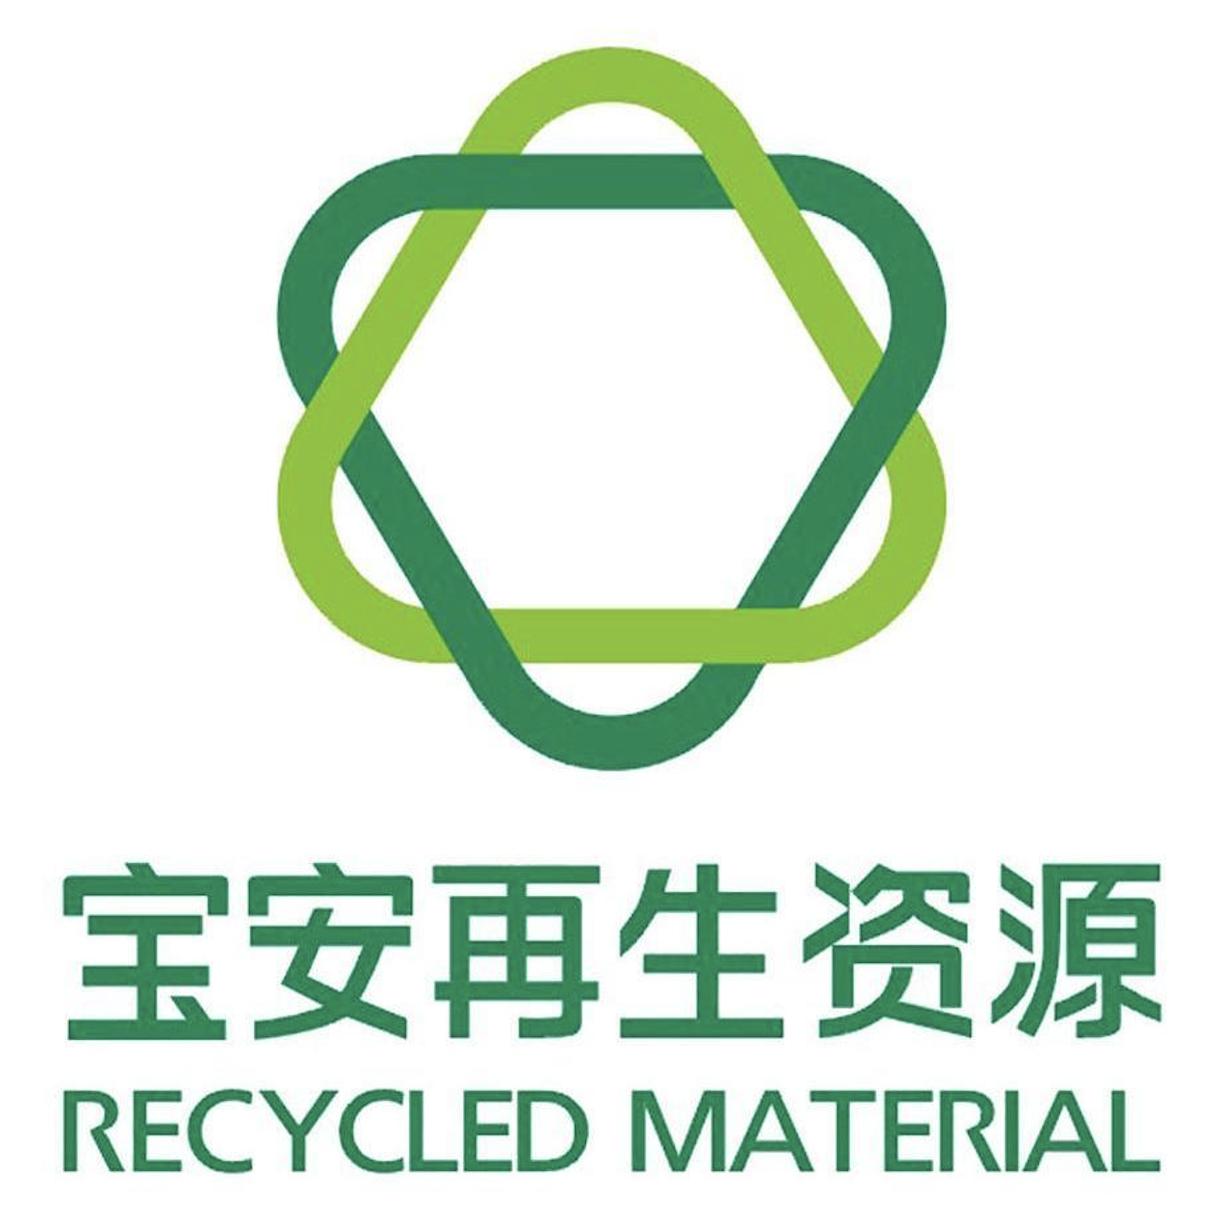 BAO AN Recycled Material Ltd